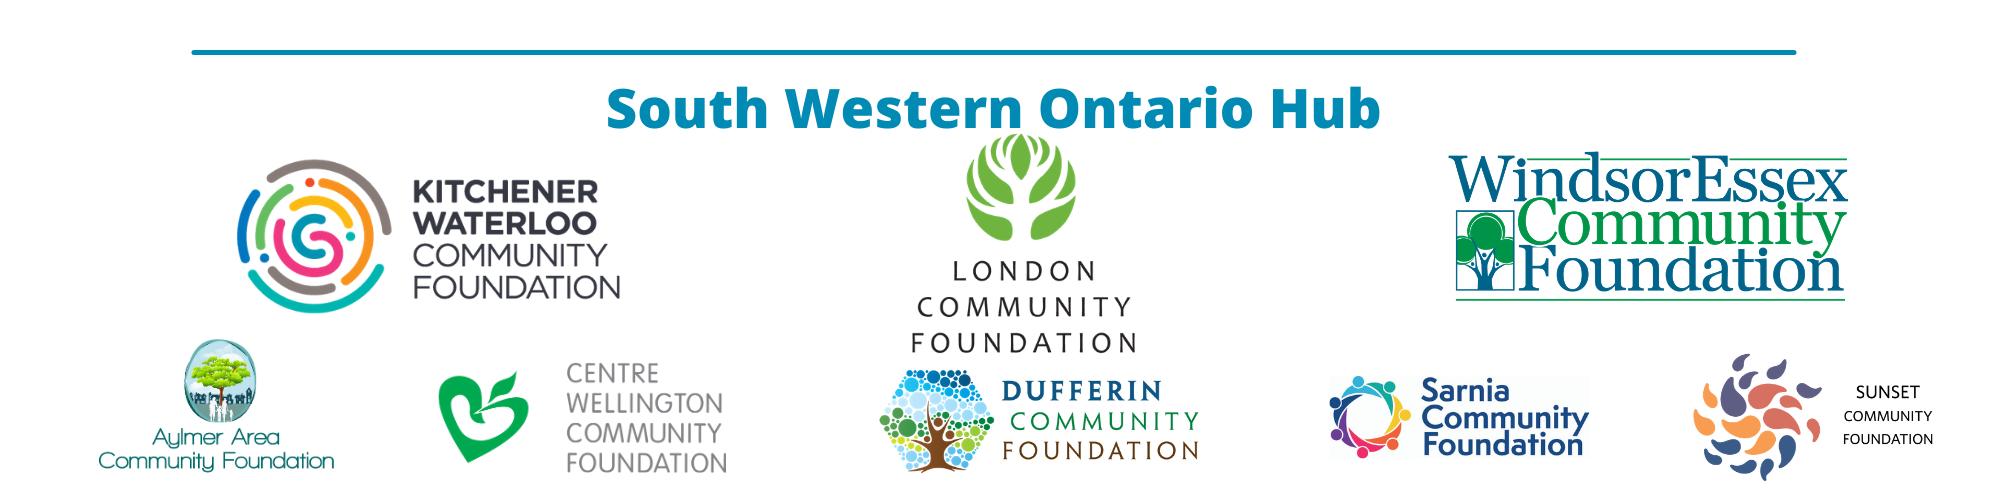 South Western Ontario Hub